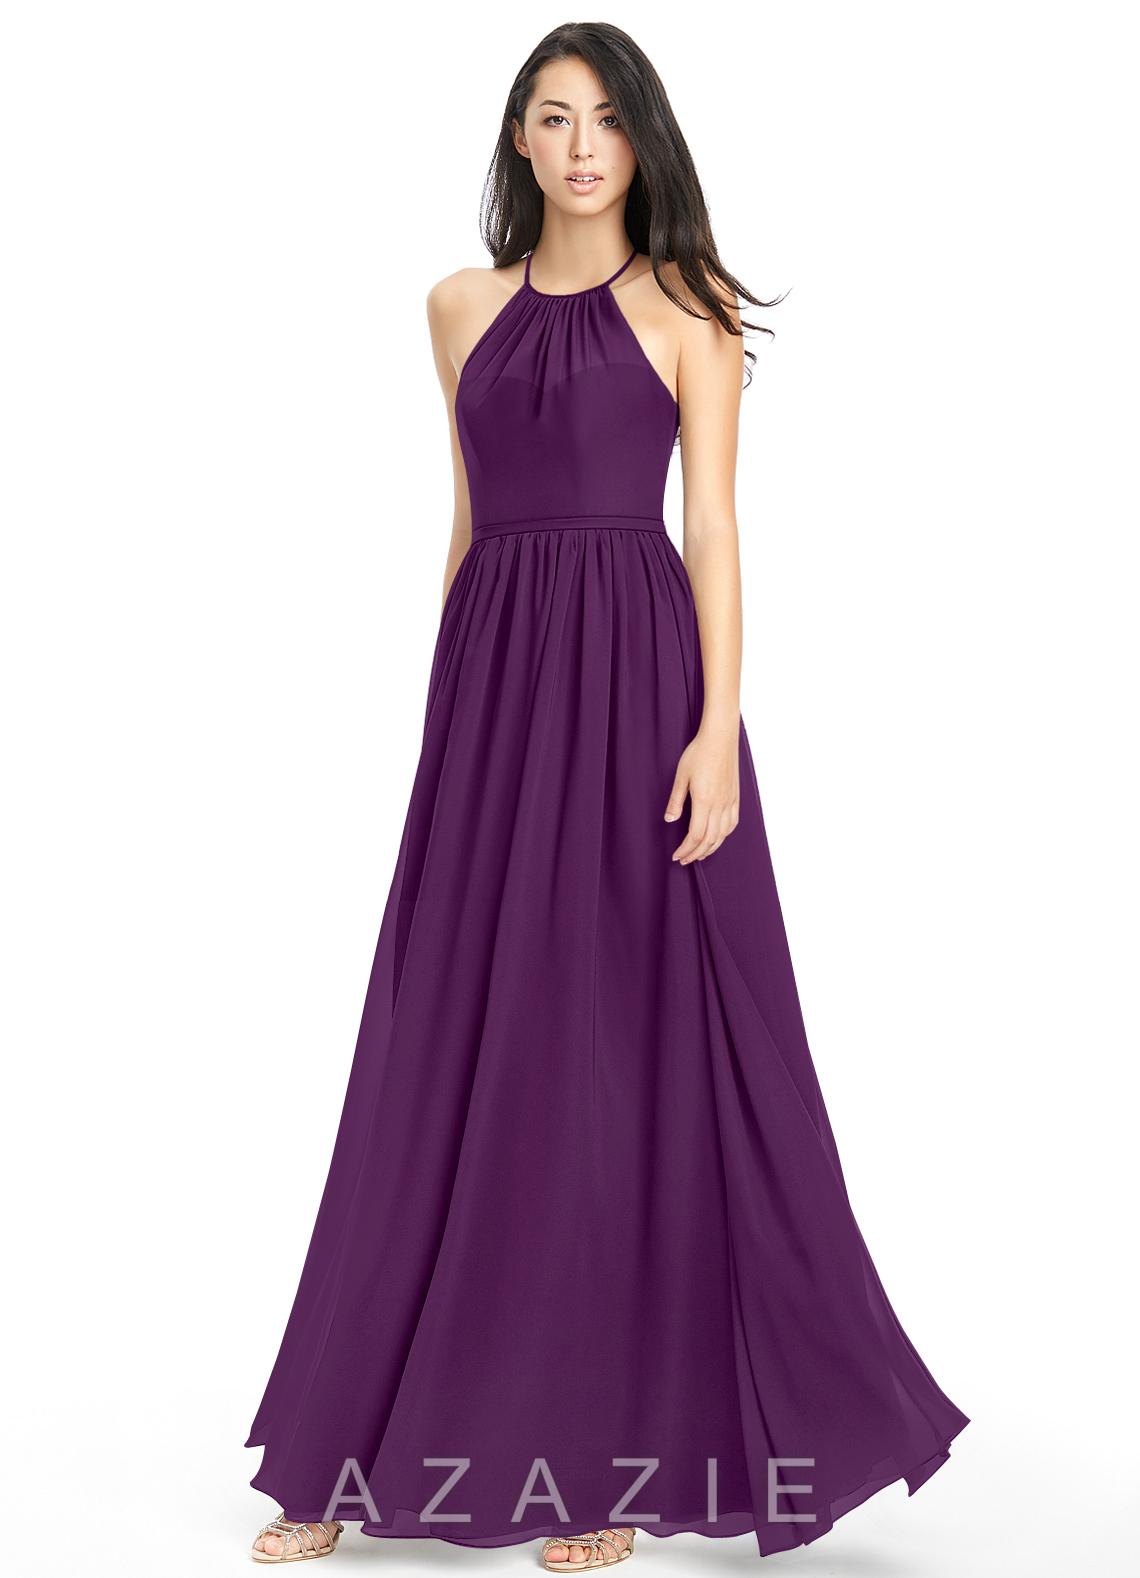 220ebcfd1f9 Azazie Kailyn Bridesmaid Dress - Grape